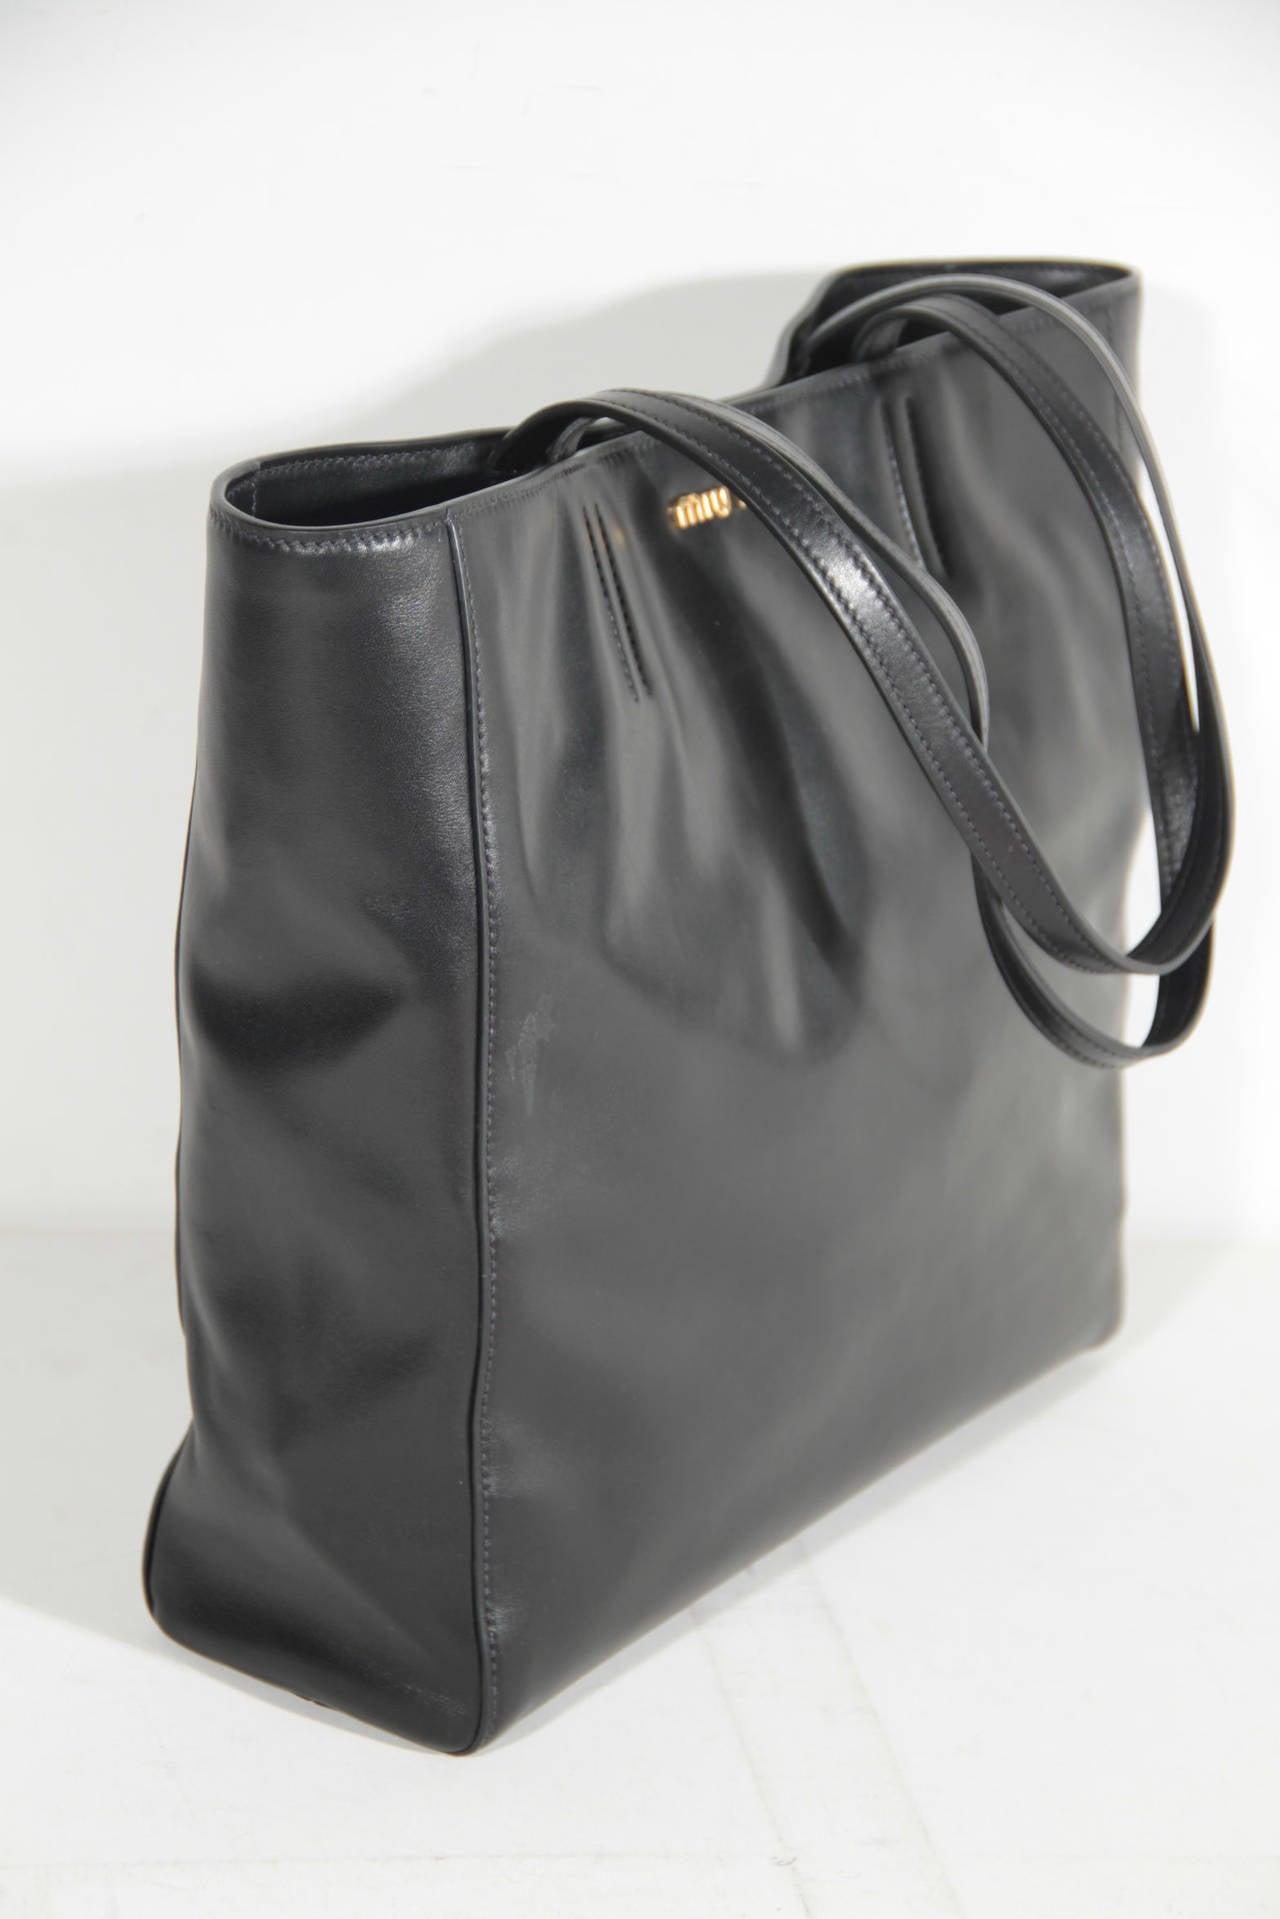 MIU MIU PRADA Black SOFT CALF Leather SHOPPING BAG Tote HANDBAG ...